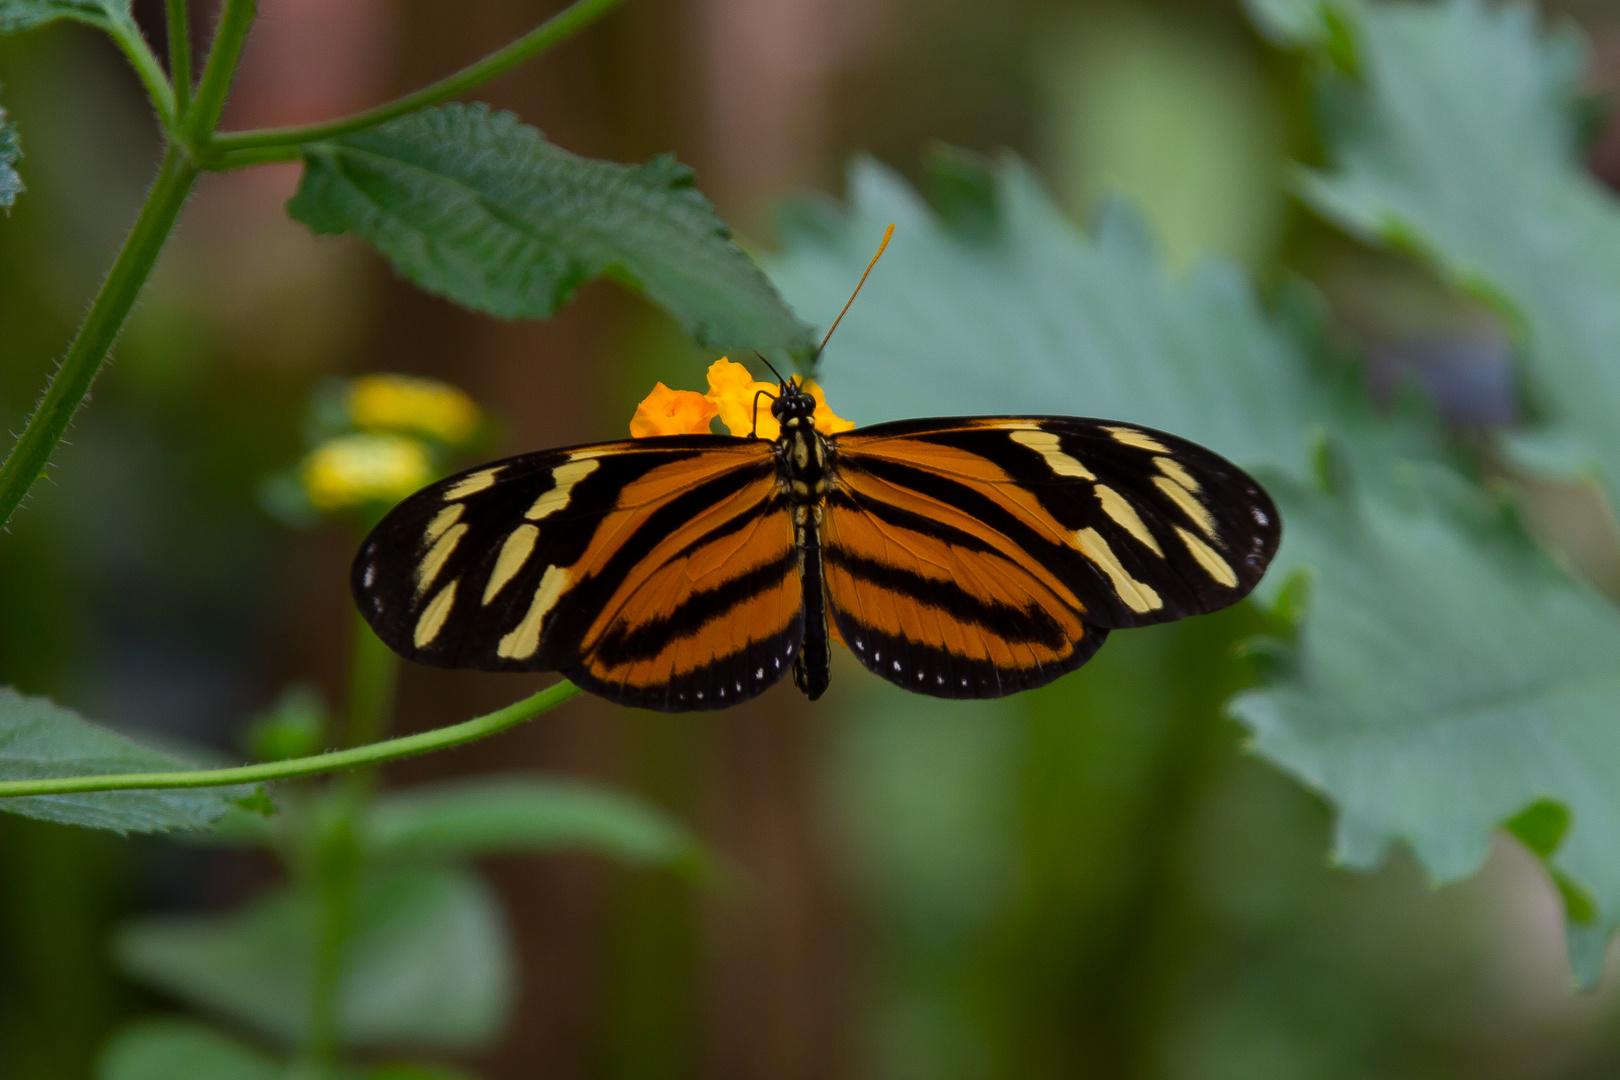 Schmetterlings-Park auf Fehmarn #4